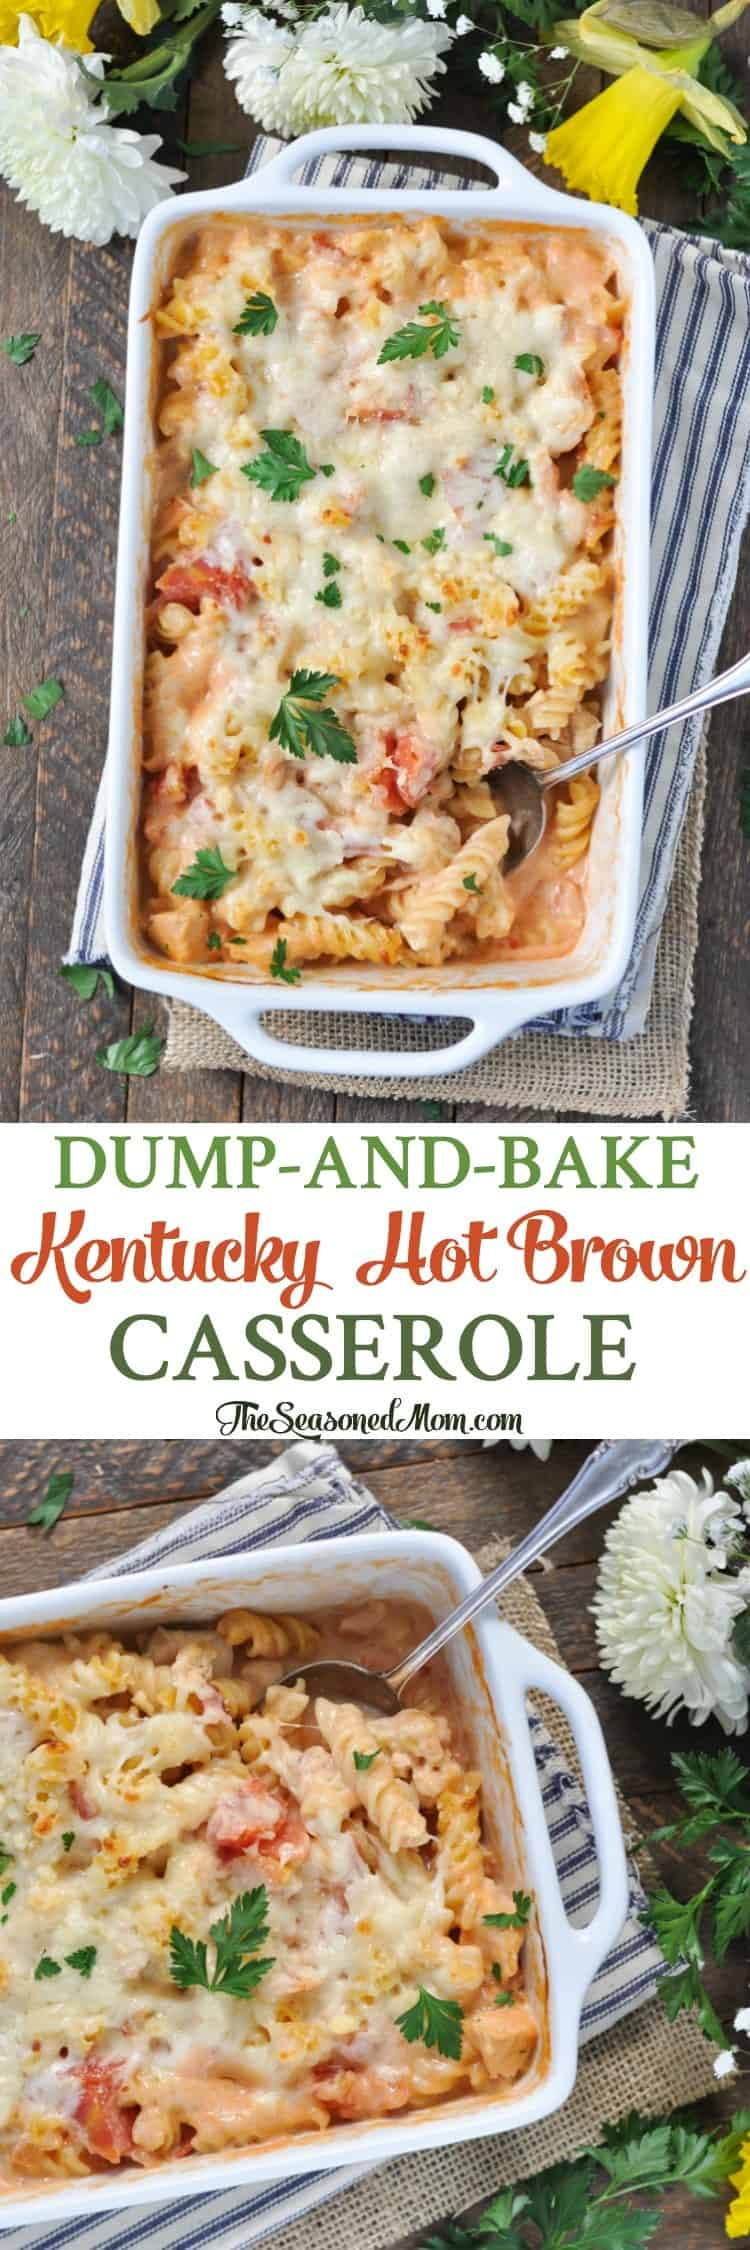 Dump-and-Bake Kentucky Hot Brown Casserole! Derby Party   Easy Dinner Recipes   Dinner Ideas   Pasta Recipes   Chicken Recipes   Turkey Recipes   Casserole Recipes